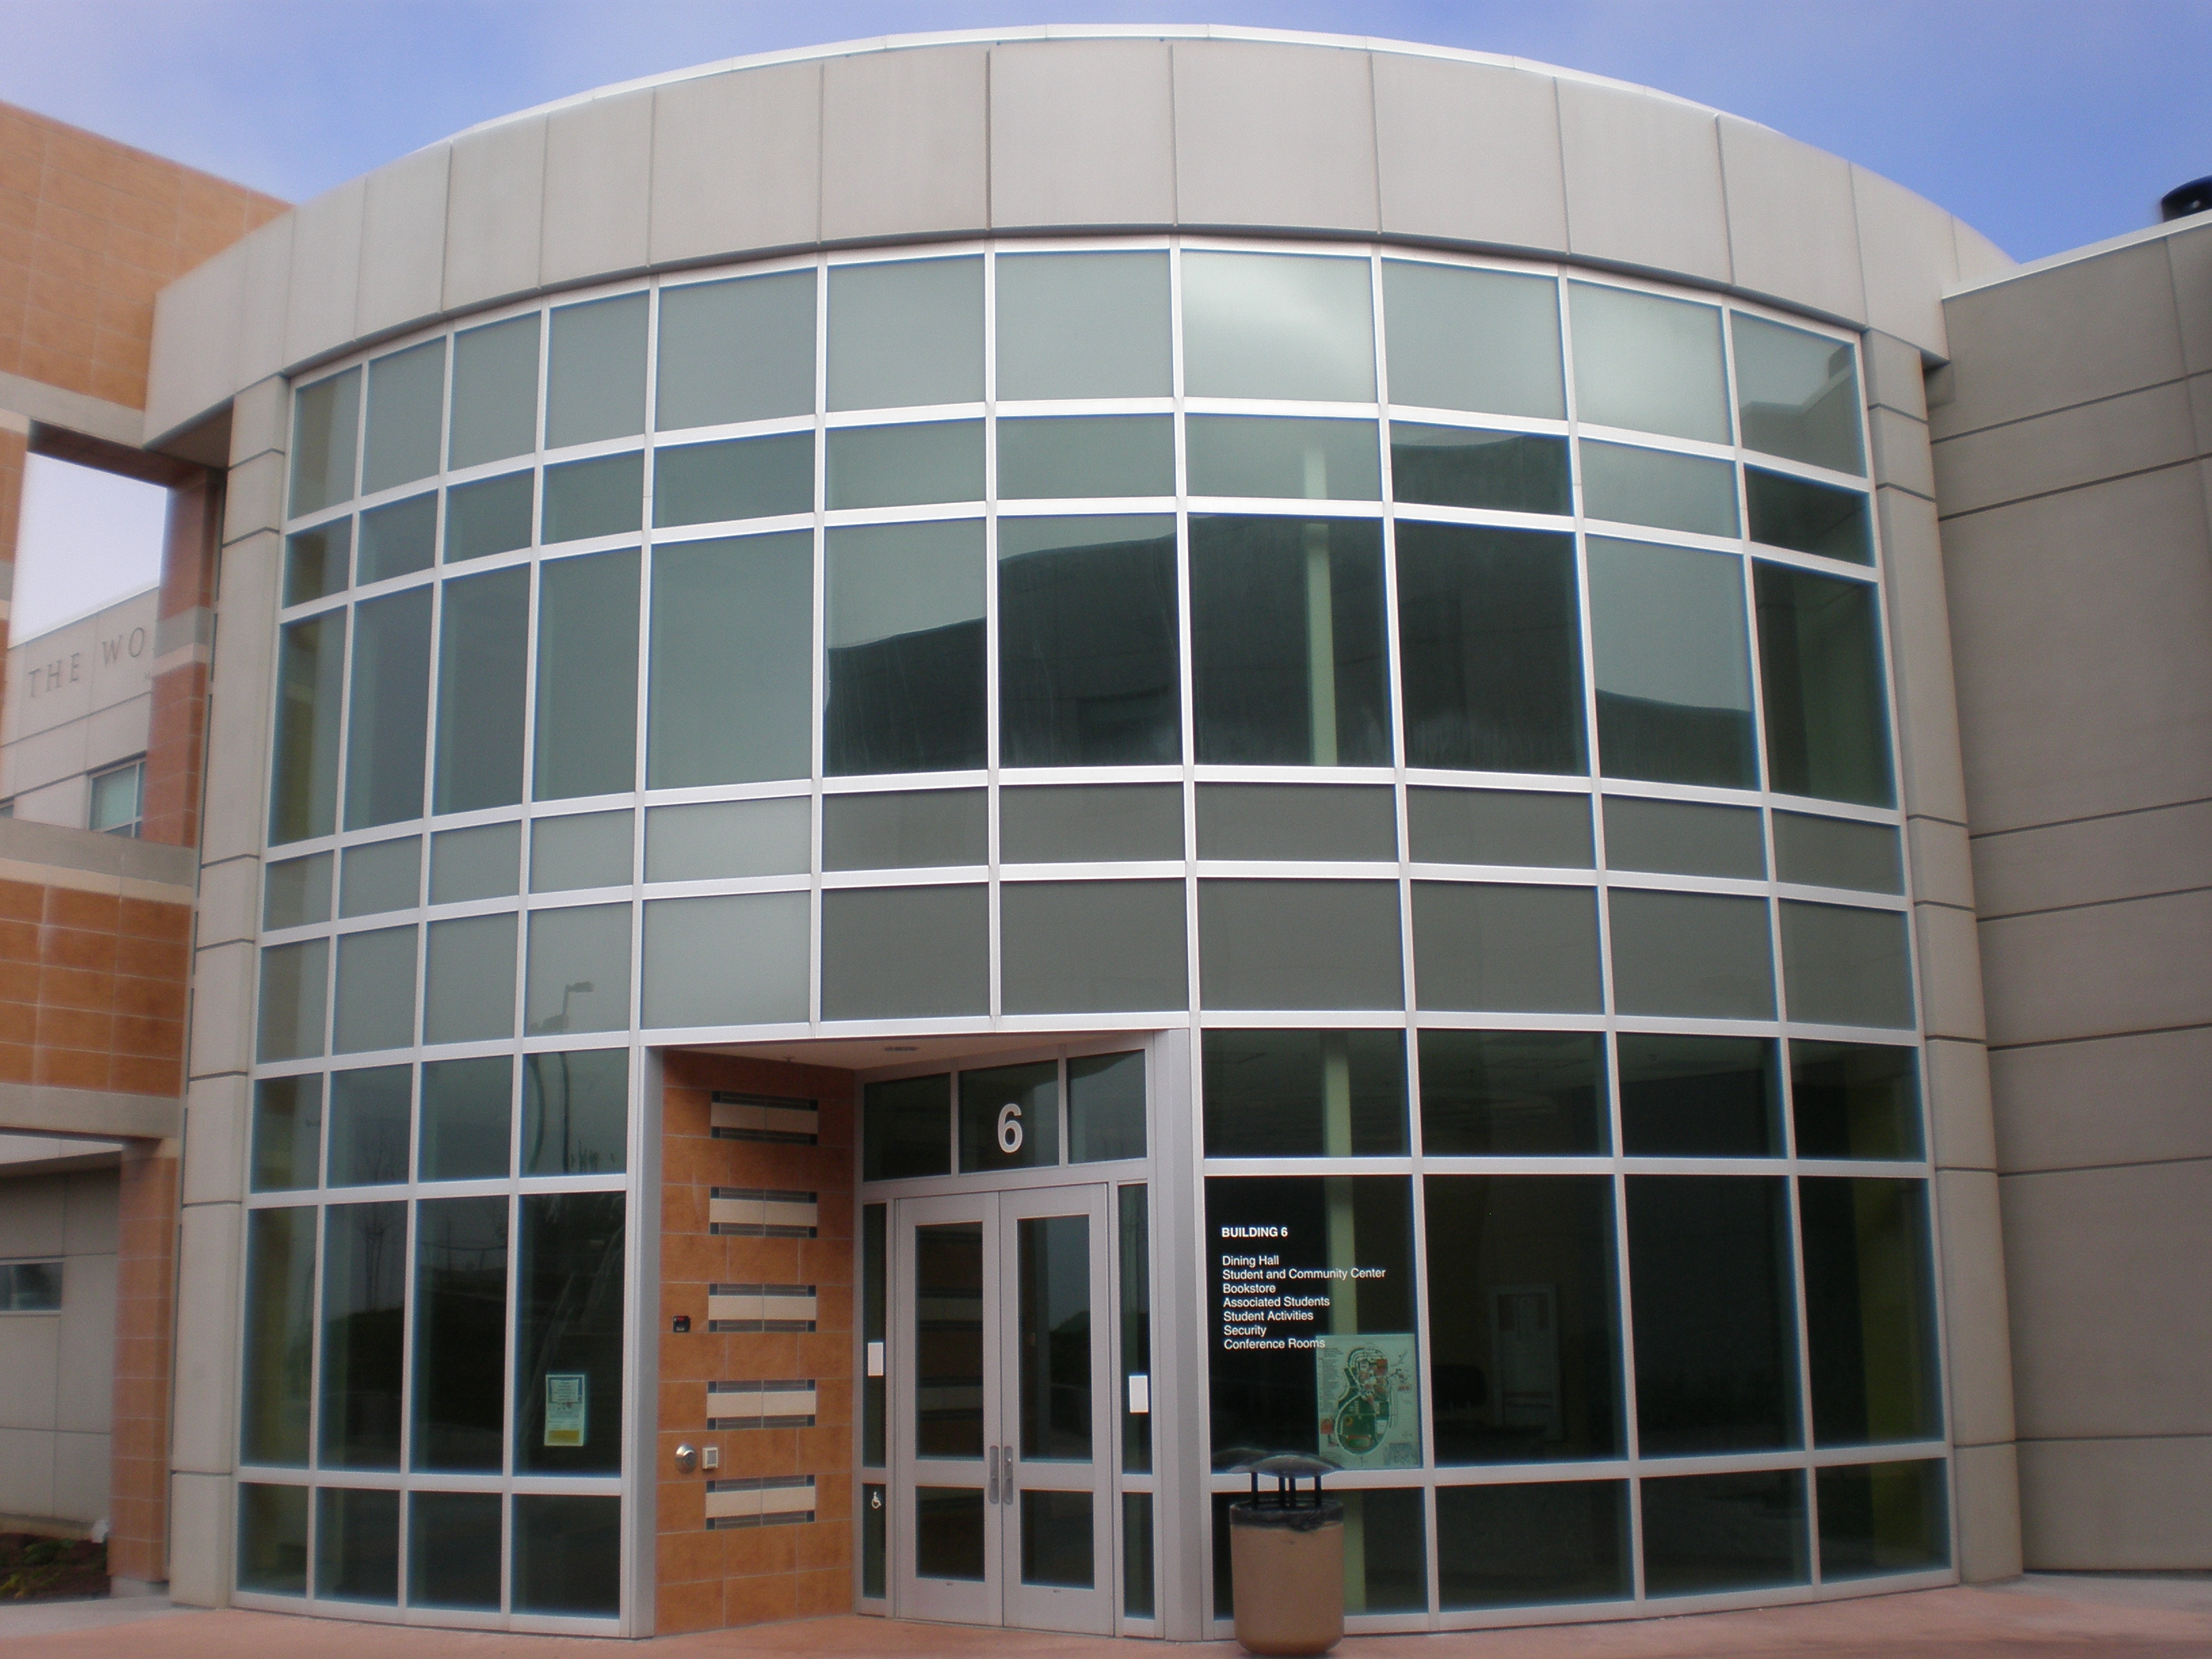 File:Skyline College Building 6 main entrance.JPG ...